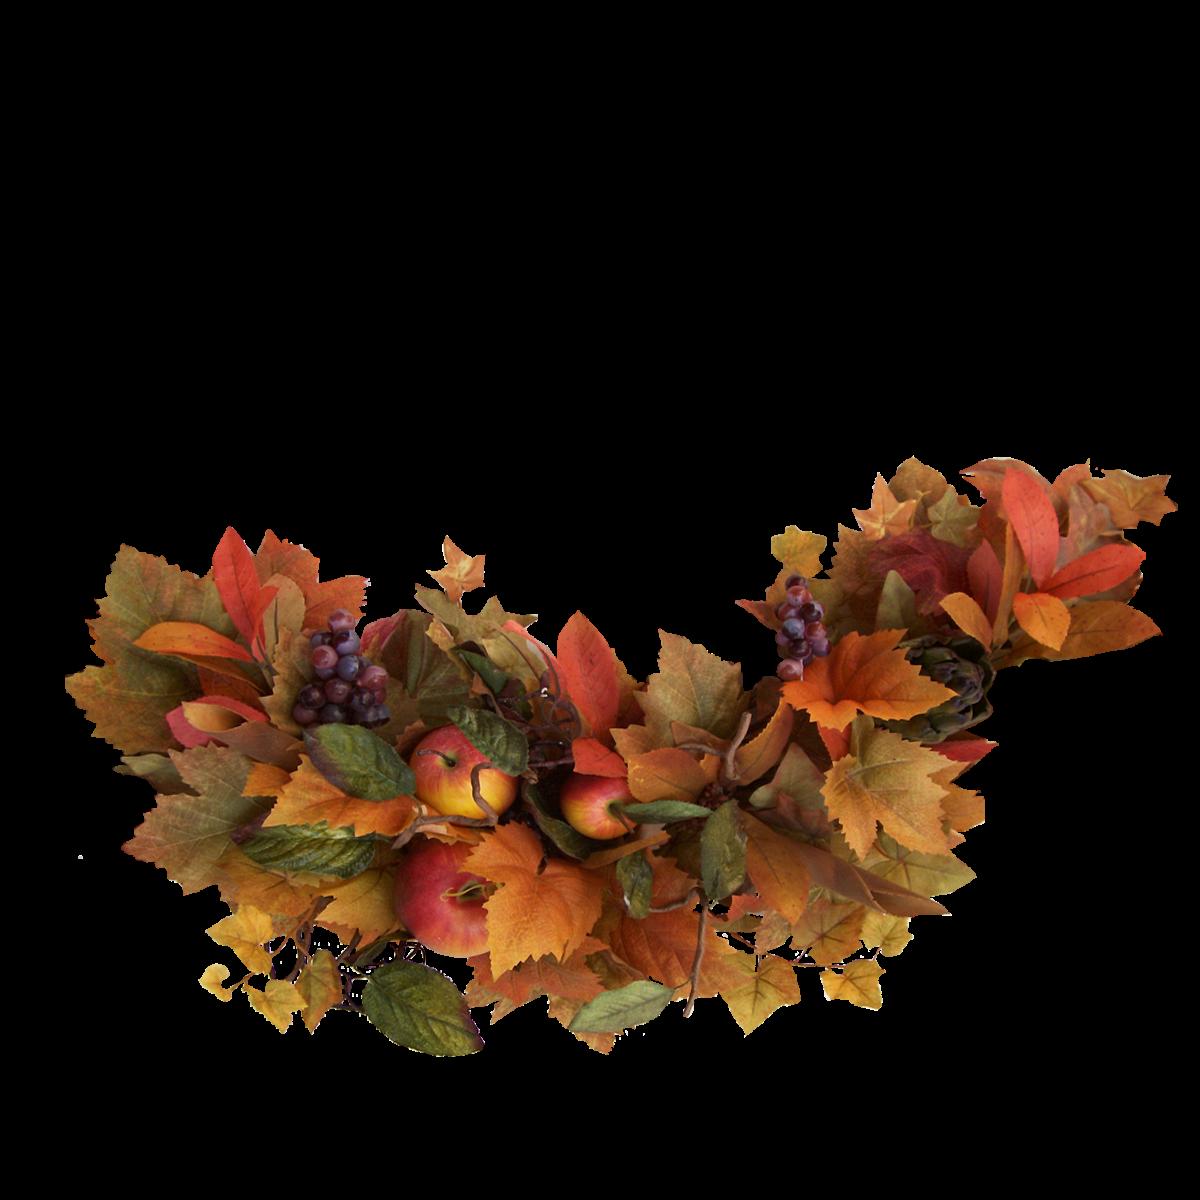 Leaf clipart thanksgiving. Digital scrapbooking clip art